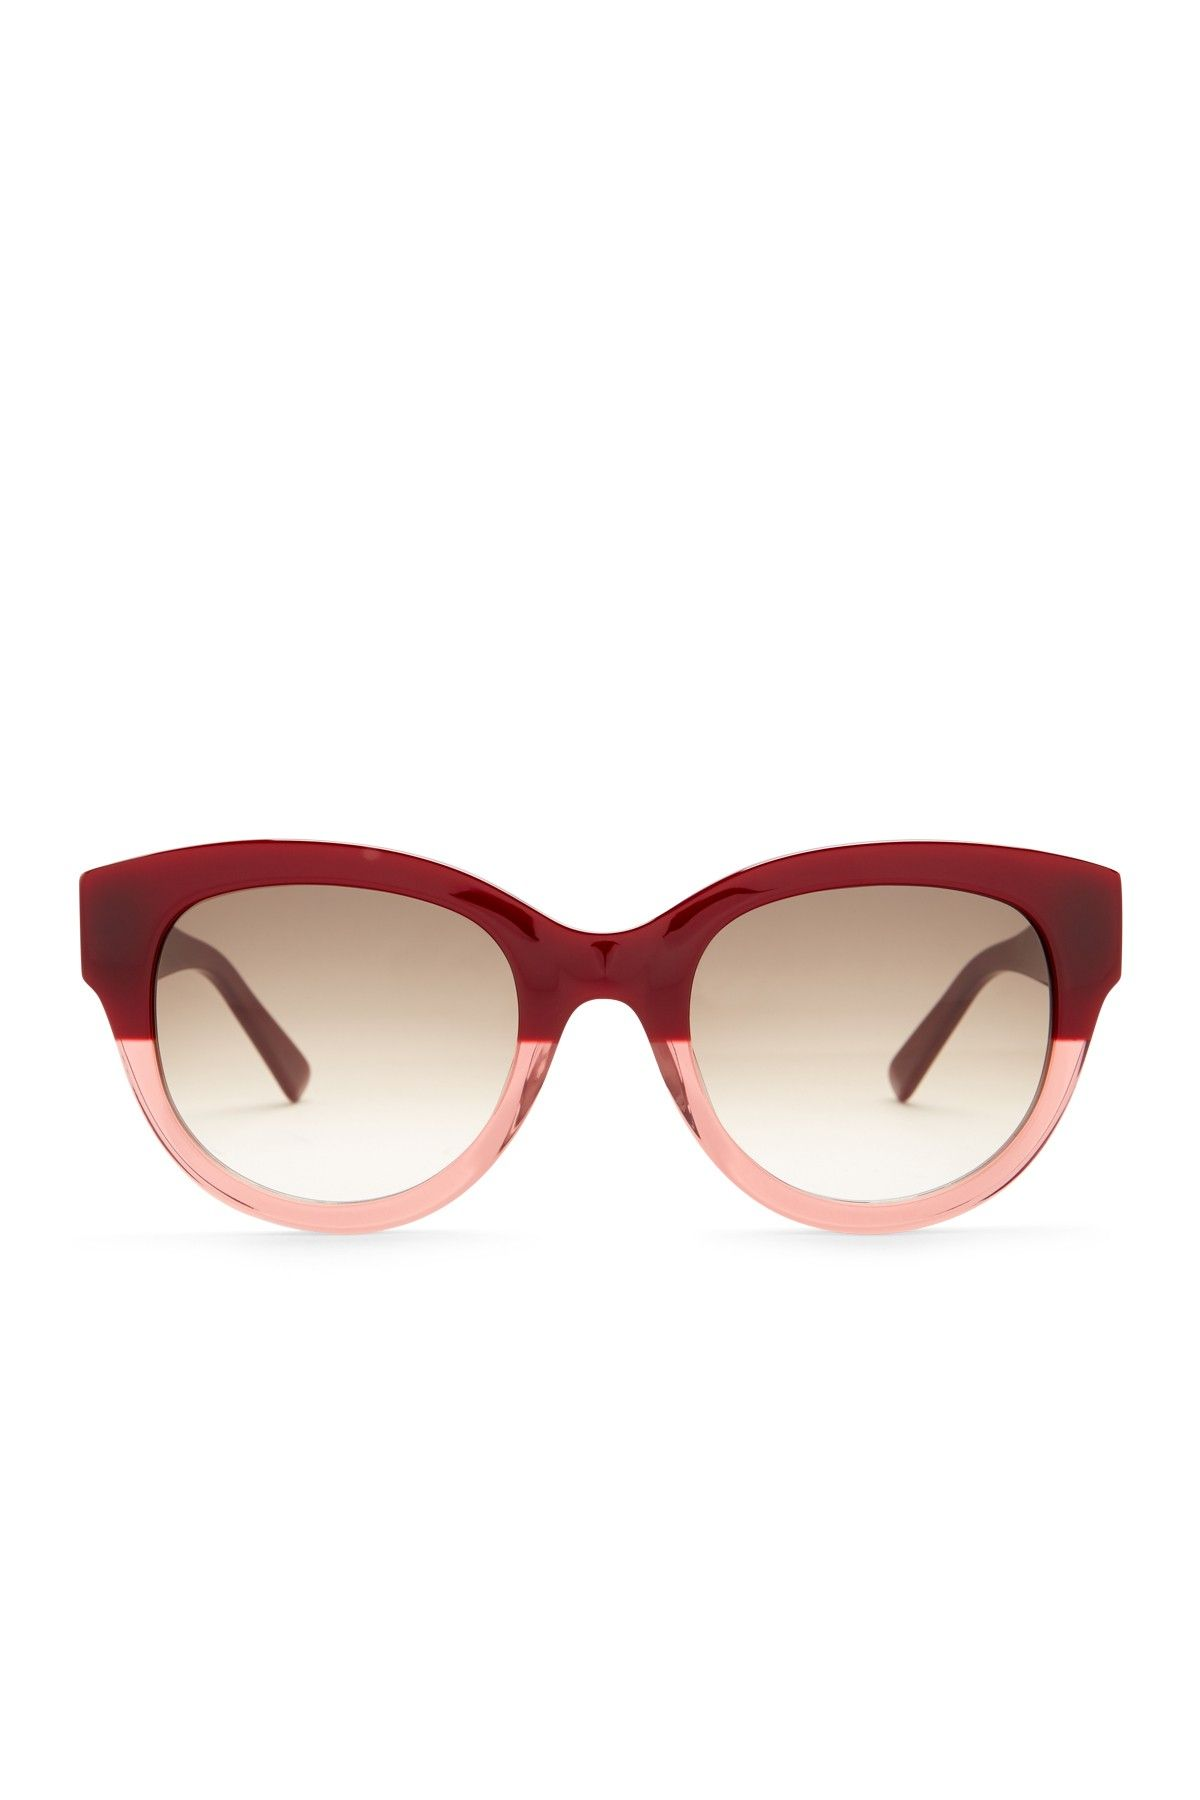 6826cc10b3 MCM Cat Eye 53mm Acetate Frame Sunglasses